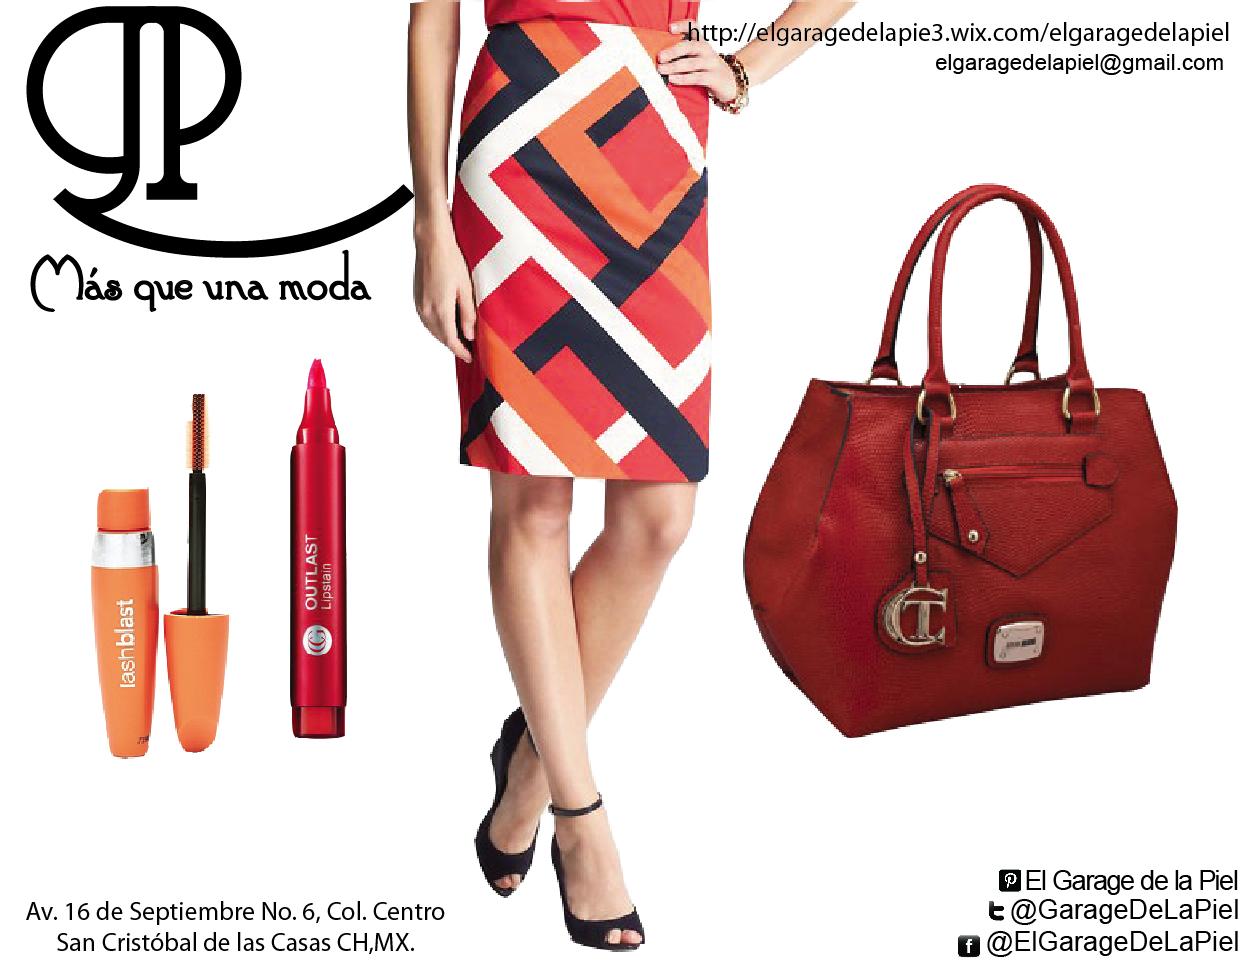 #bolsa #naranja #chic #fashion #ElGarageDeLaPiel @ElGarageDeLaPiel http://elgaragedelapie3.wix.com/elgaragedelapiel https://www.facebook.com/ElGarageDeLaPiel